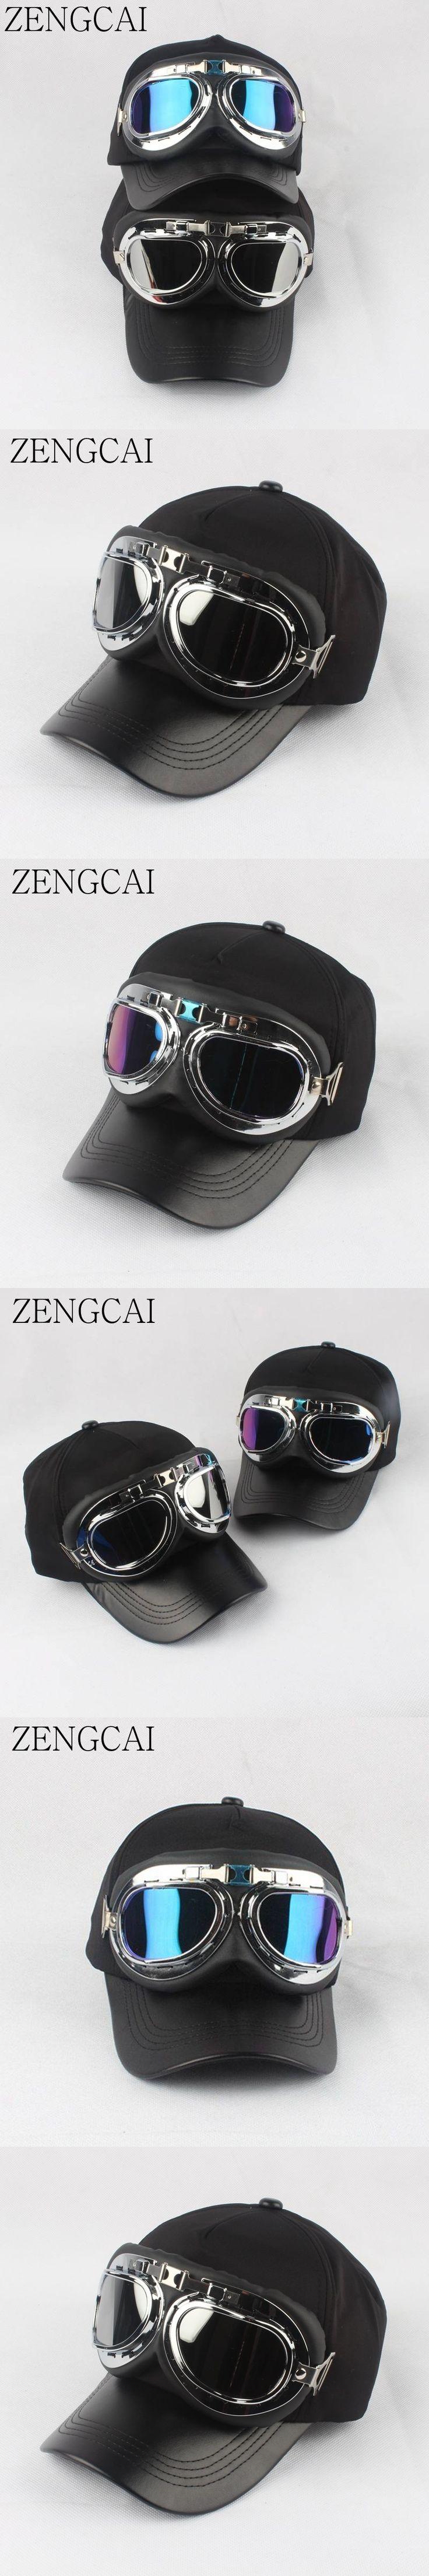 ZENGCAI Cool Snapback Cap Women Men Retro Pilots Glasses Design Baseball Caps Trendy Couple Lover Hats Black Cotton Unisex Cap